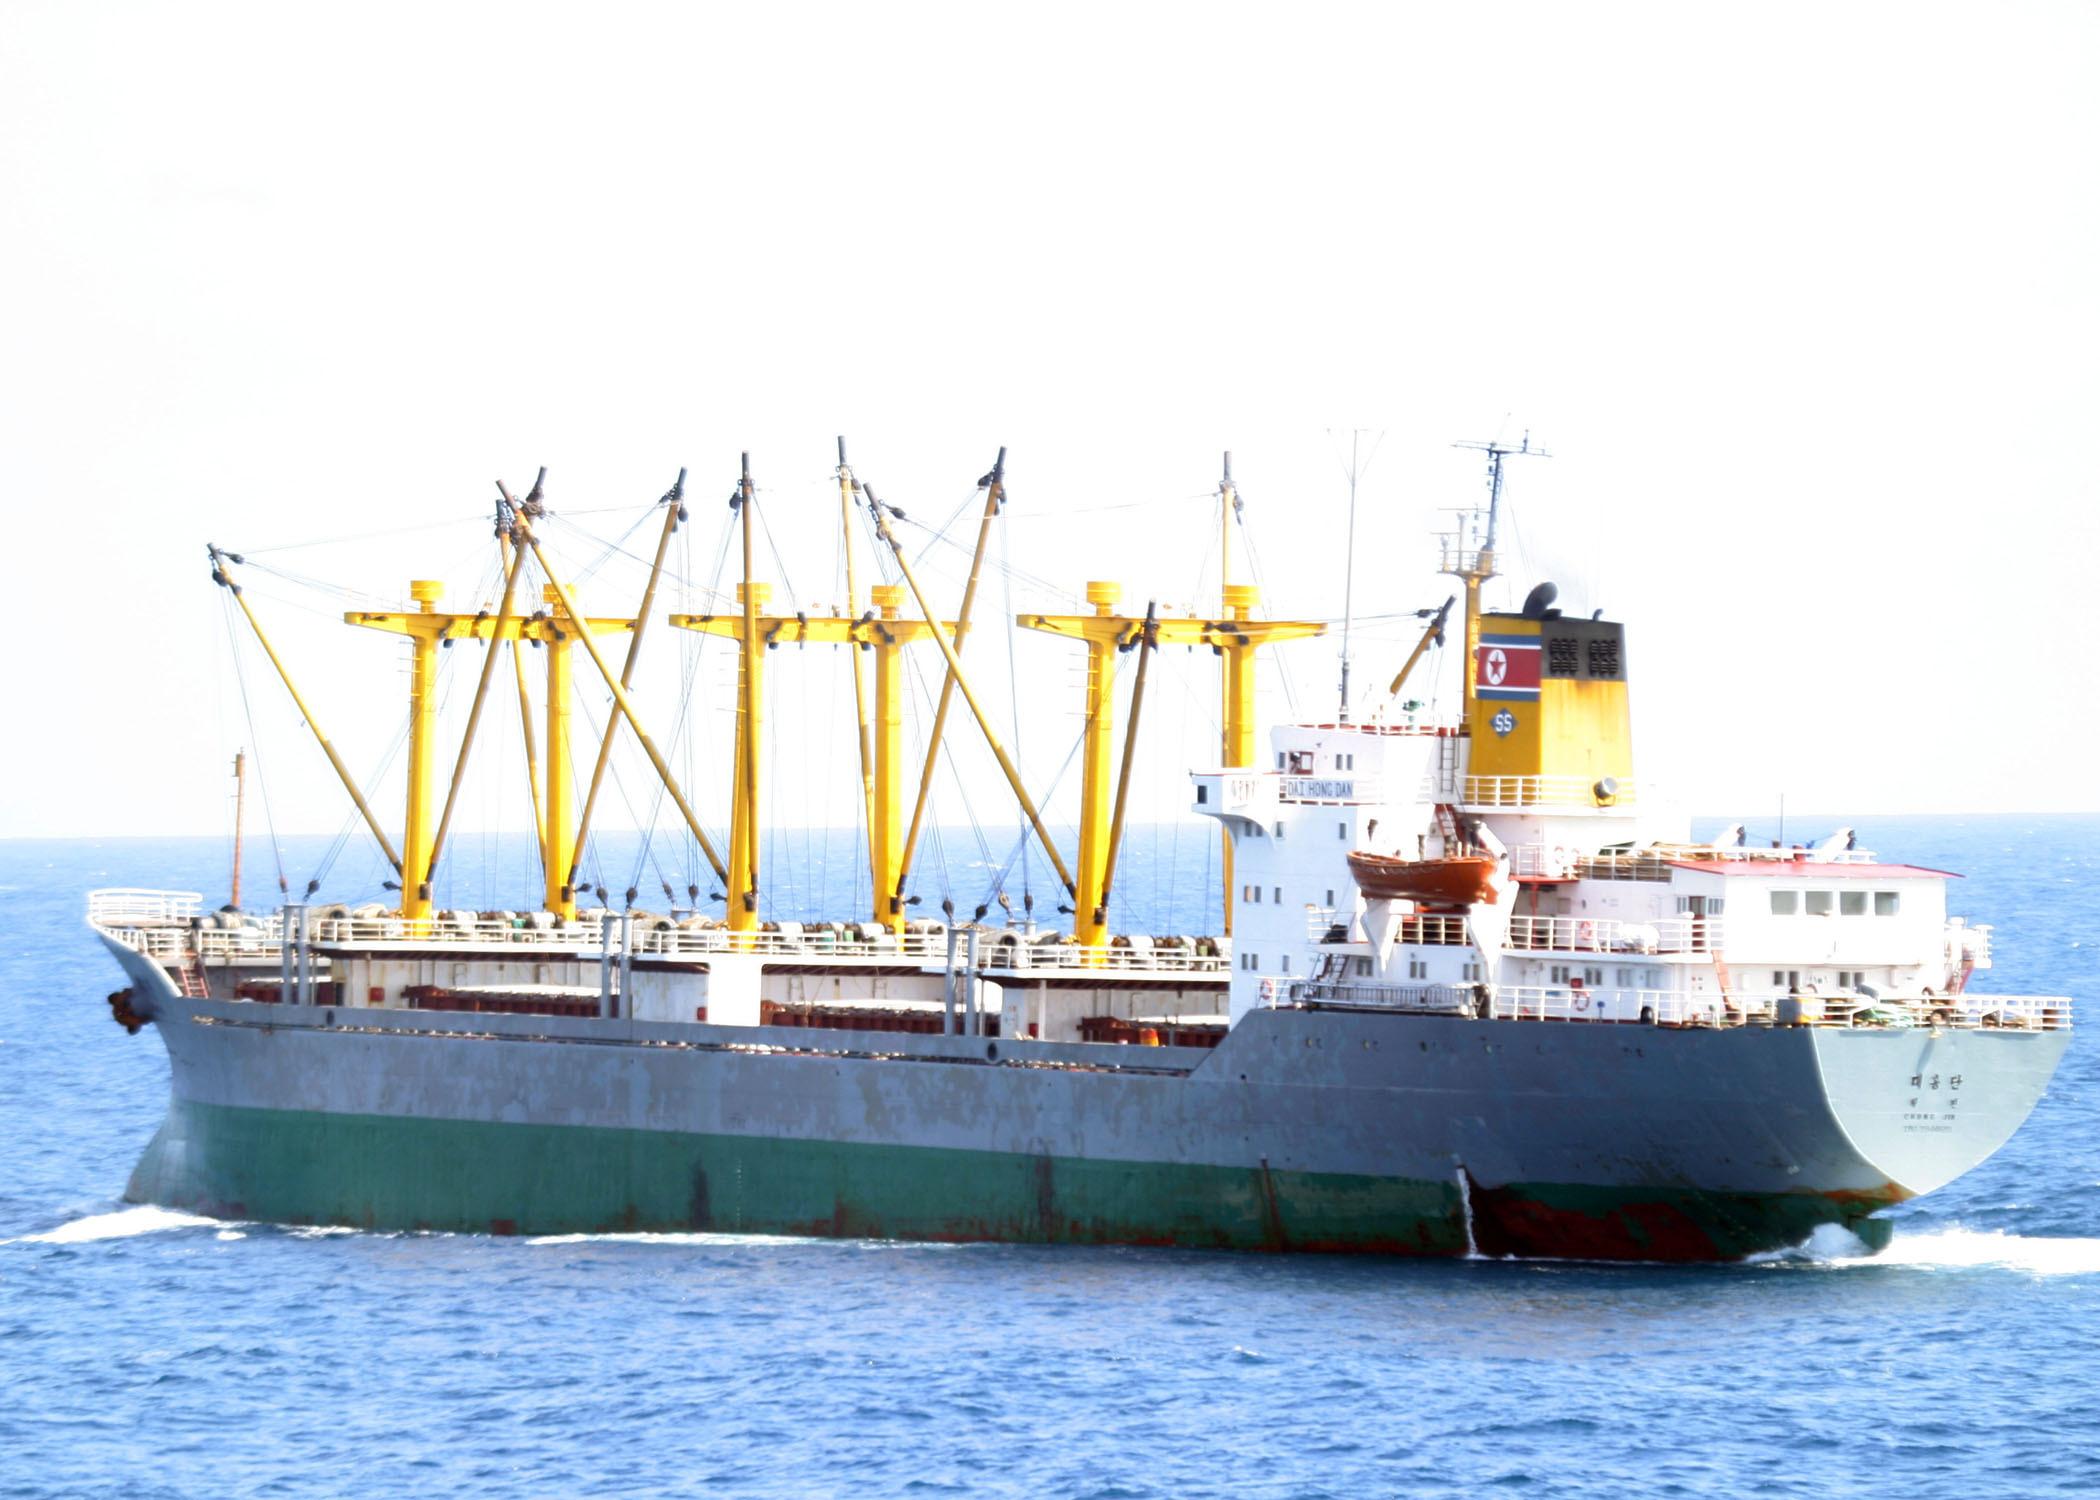 U.S._Navy_Responds_to_North_Korean_Cargo_Vessel_Distress_Call_DVIDS63372.jpg